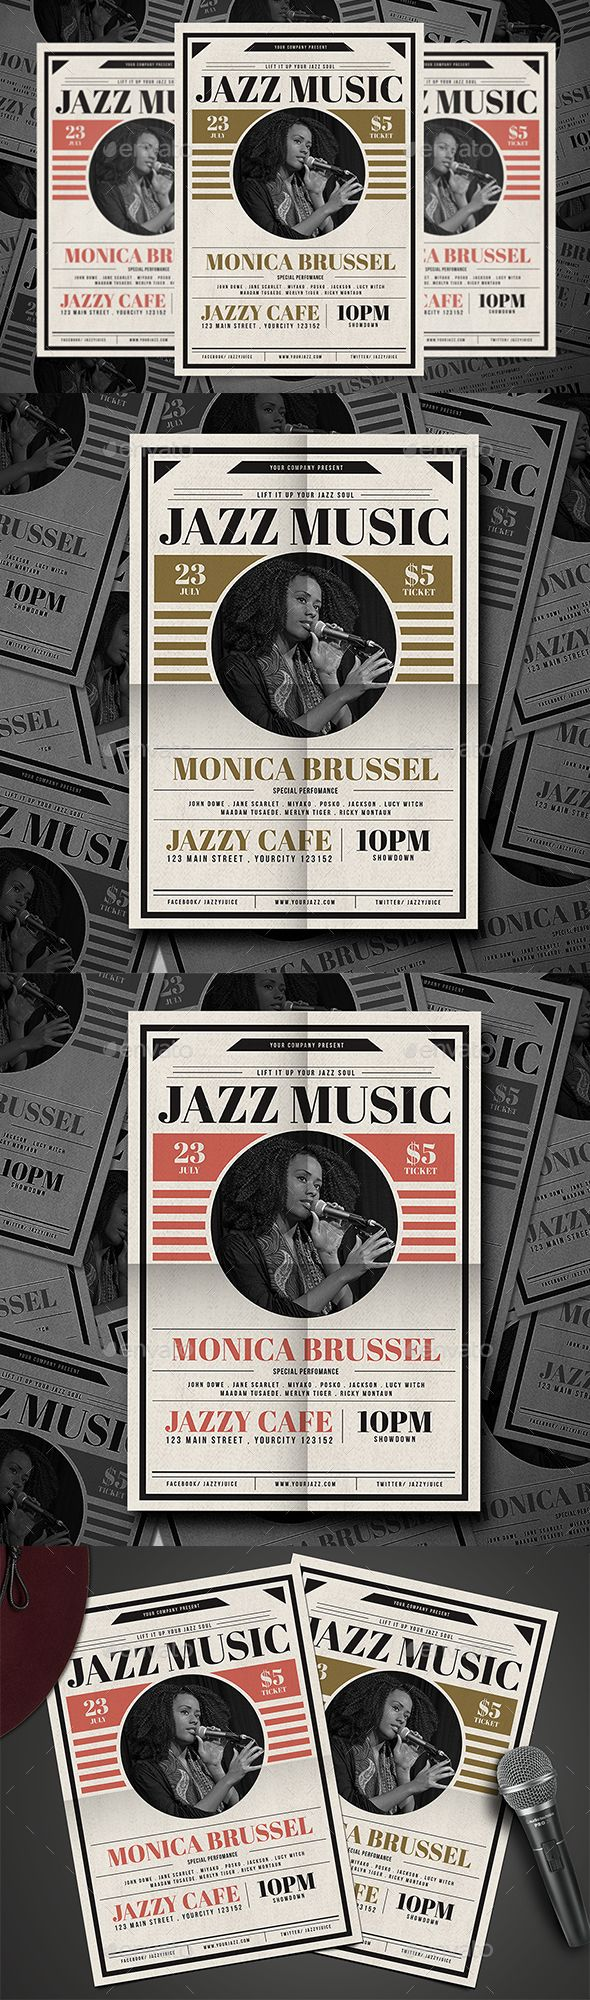 Classic Jazz Flyer Template PSD, AI Illustrator